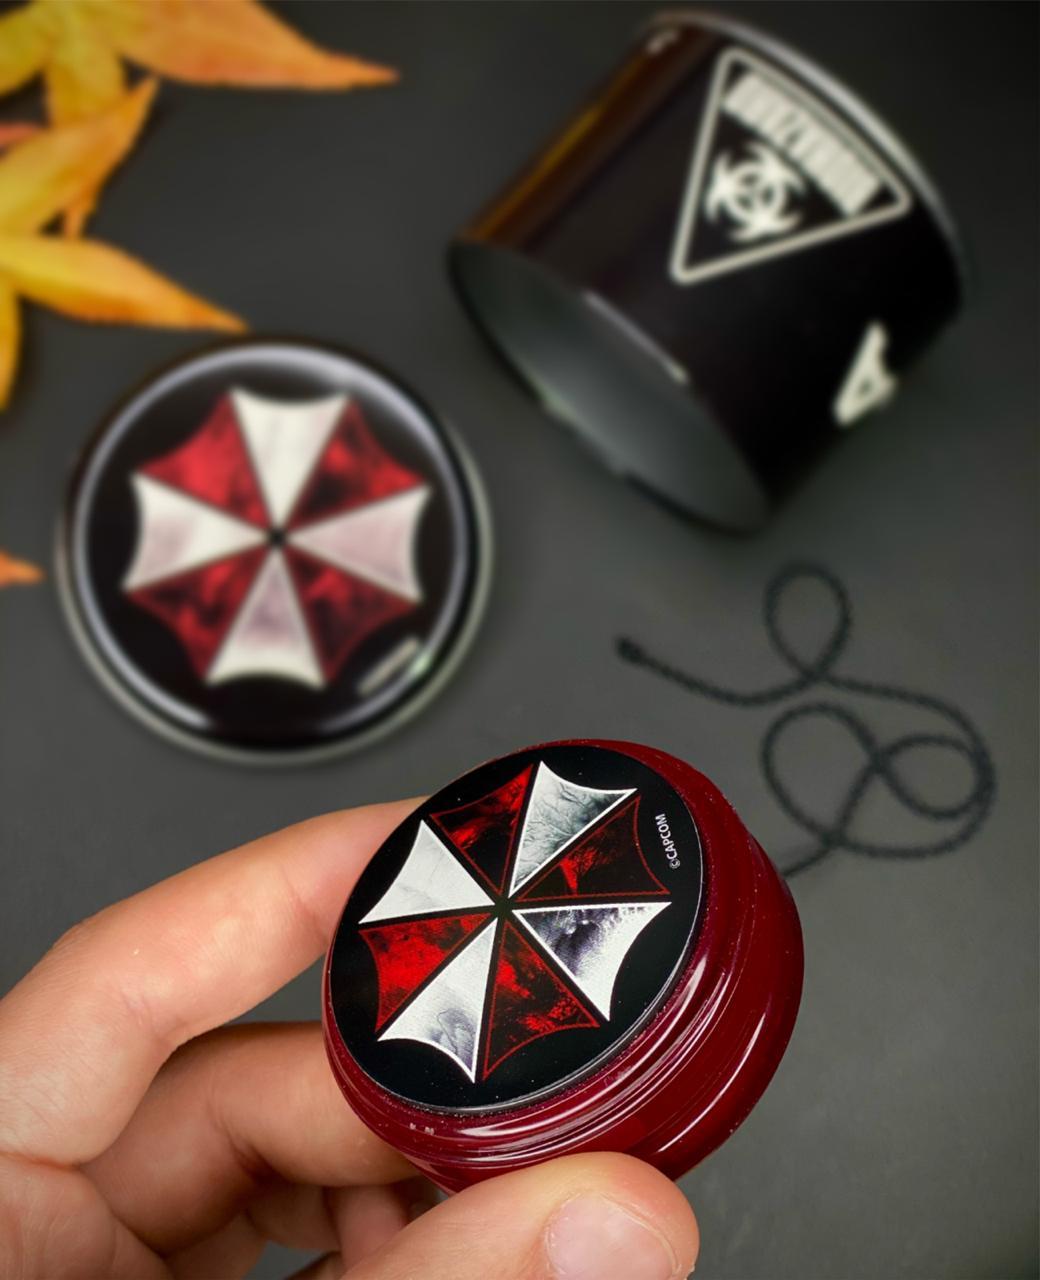 Ioiô Luxo Profissional Umbrella Corporation - Capcom